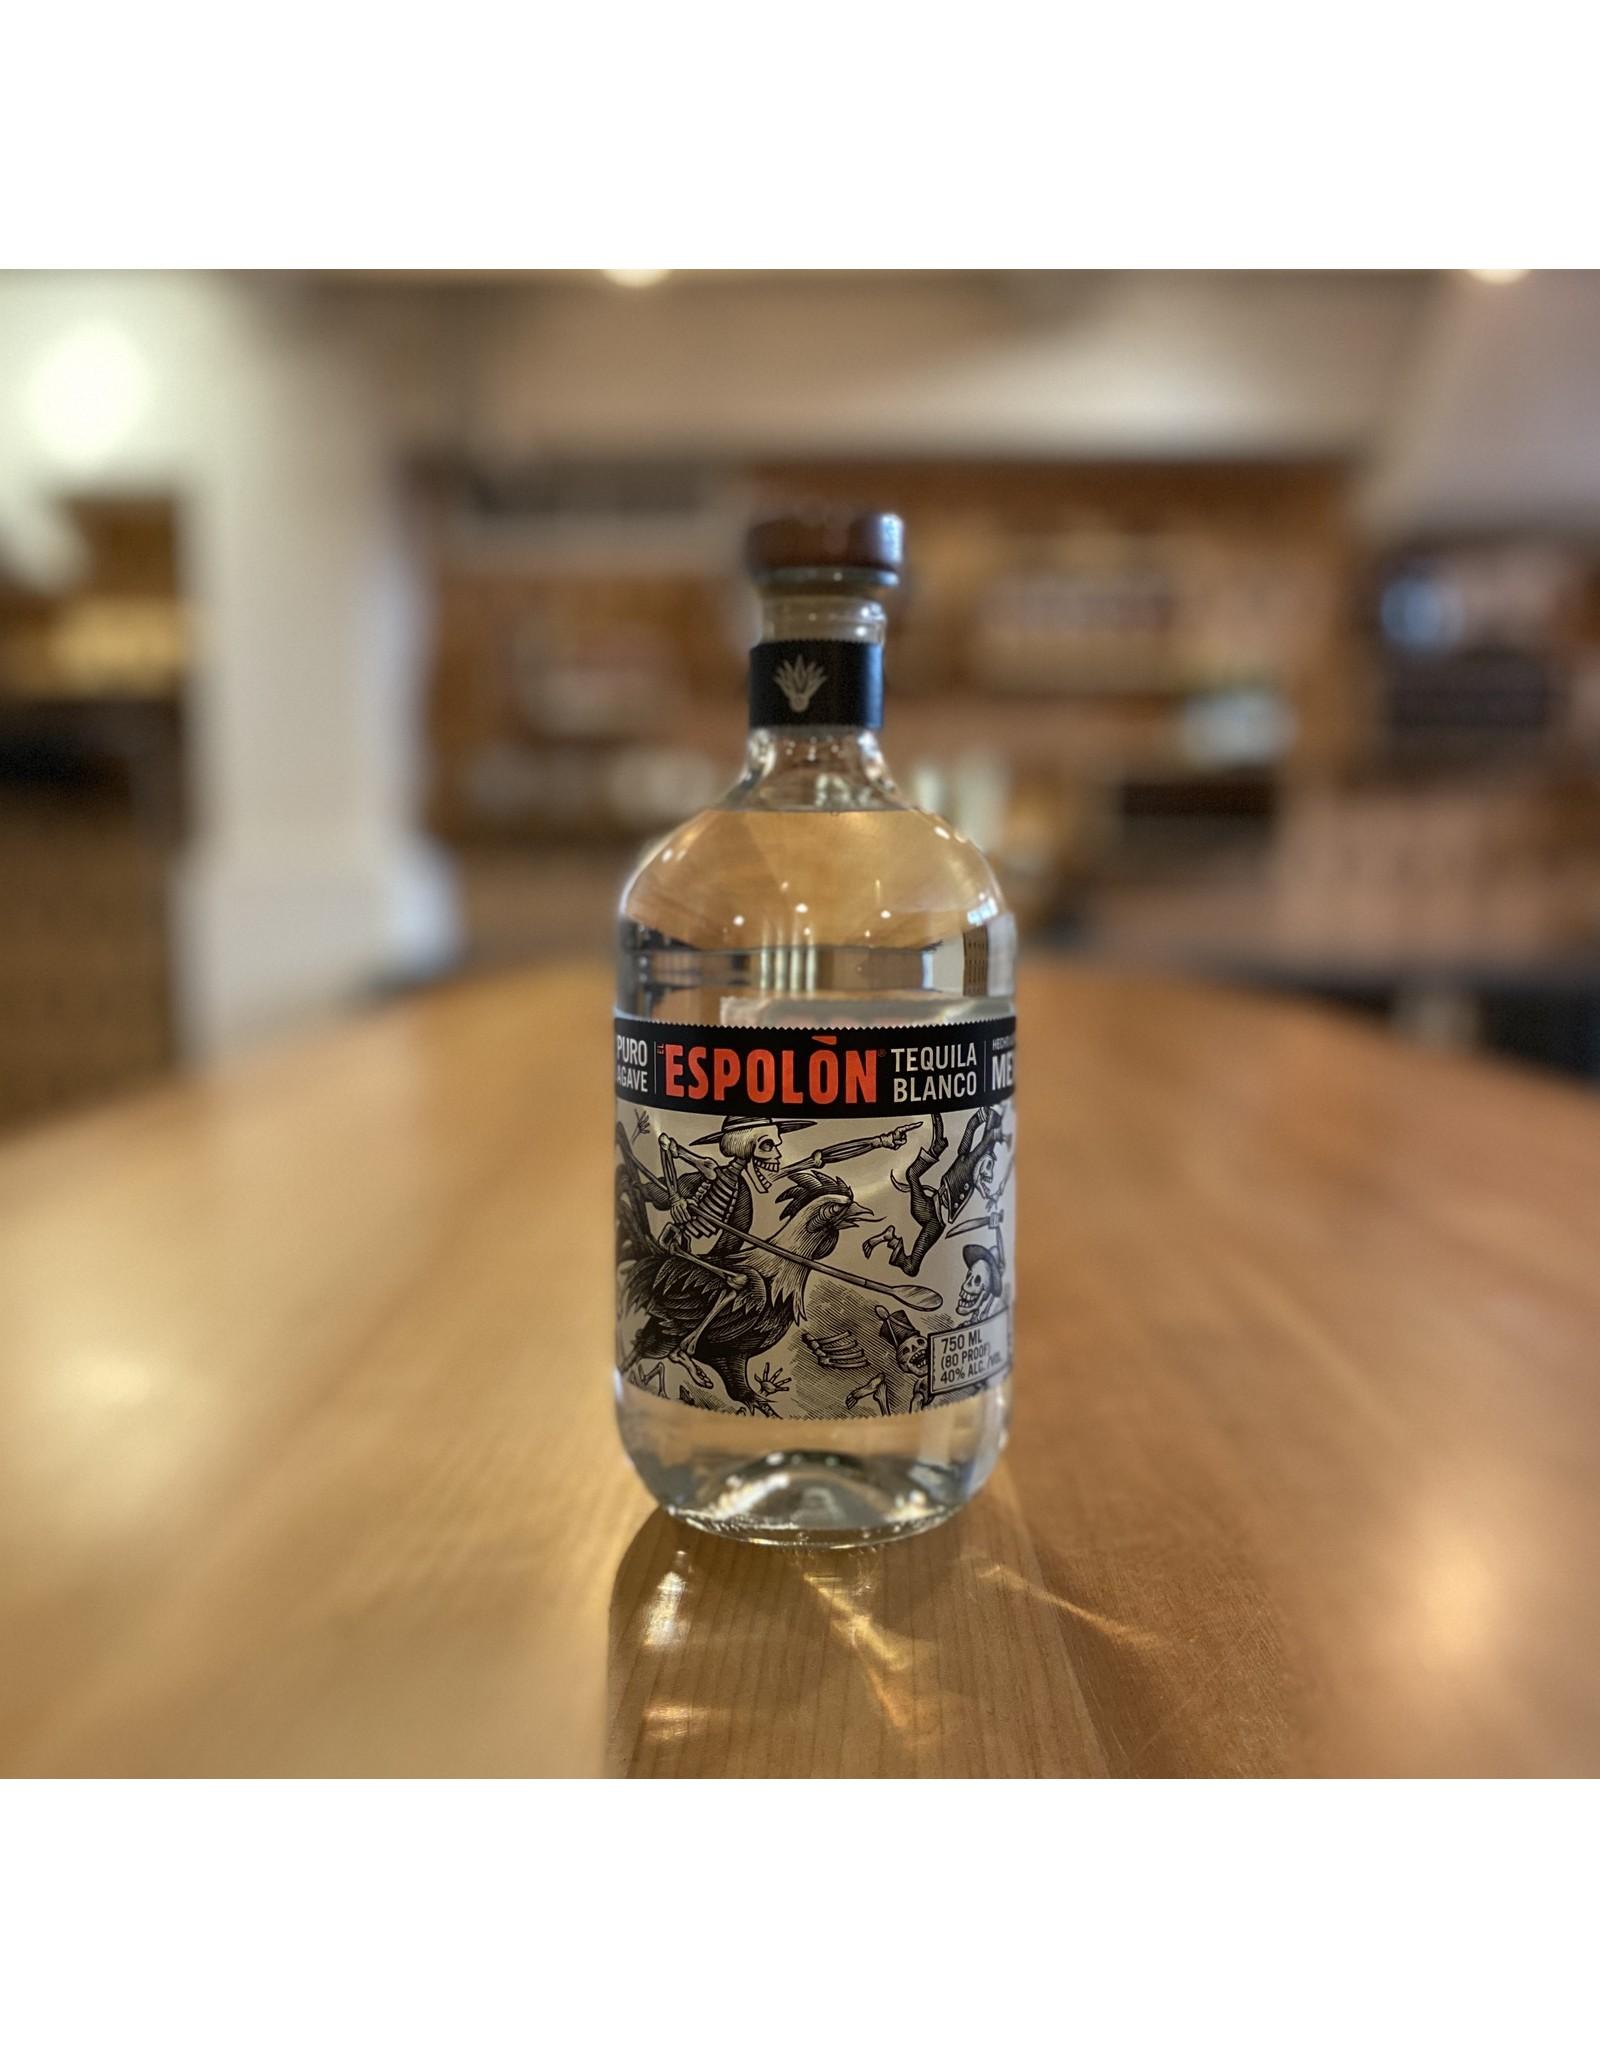 Espolon Tequila Blanco - Jalisco, MX